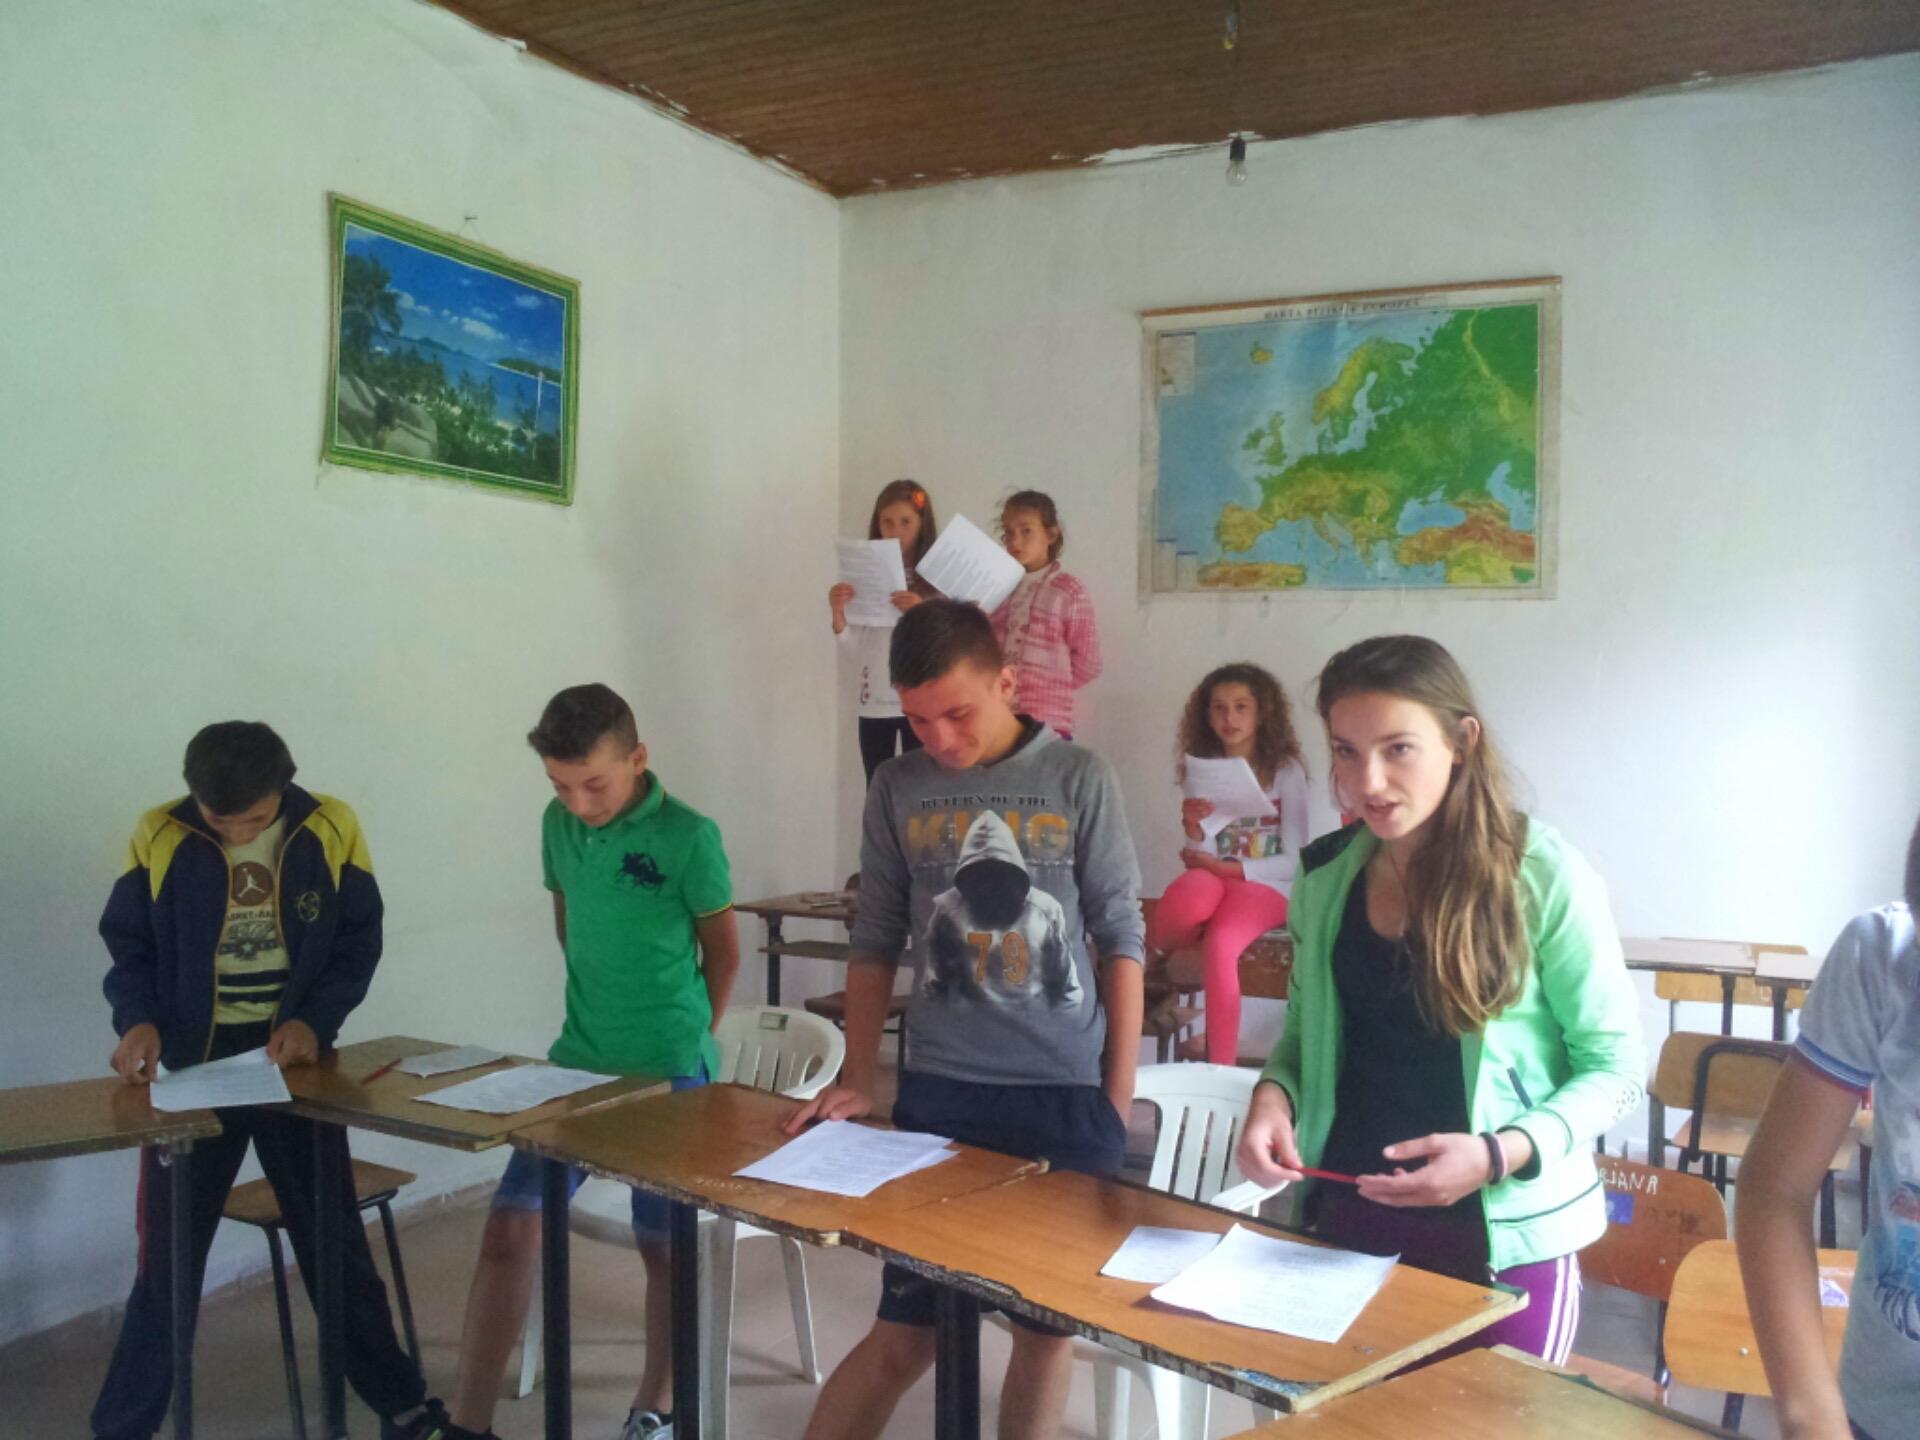 teaching Boge albanian alps